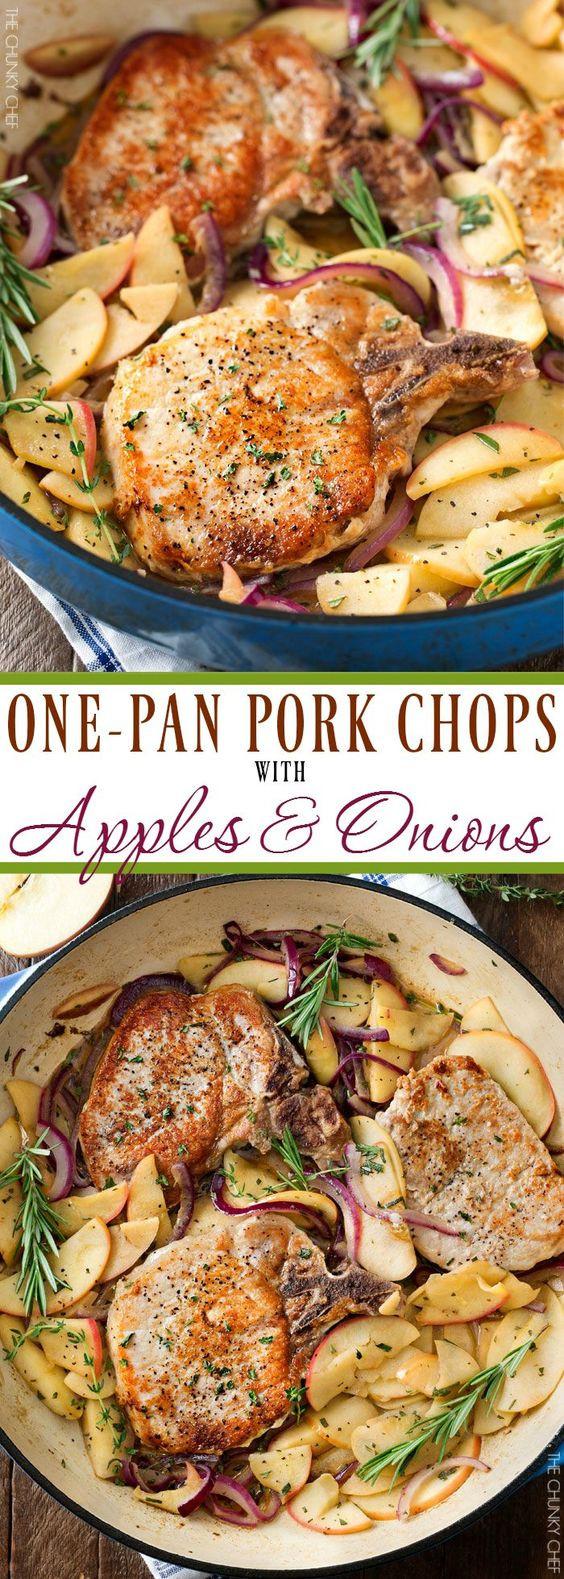 One-Pan Pork Chops